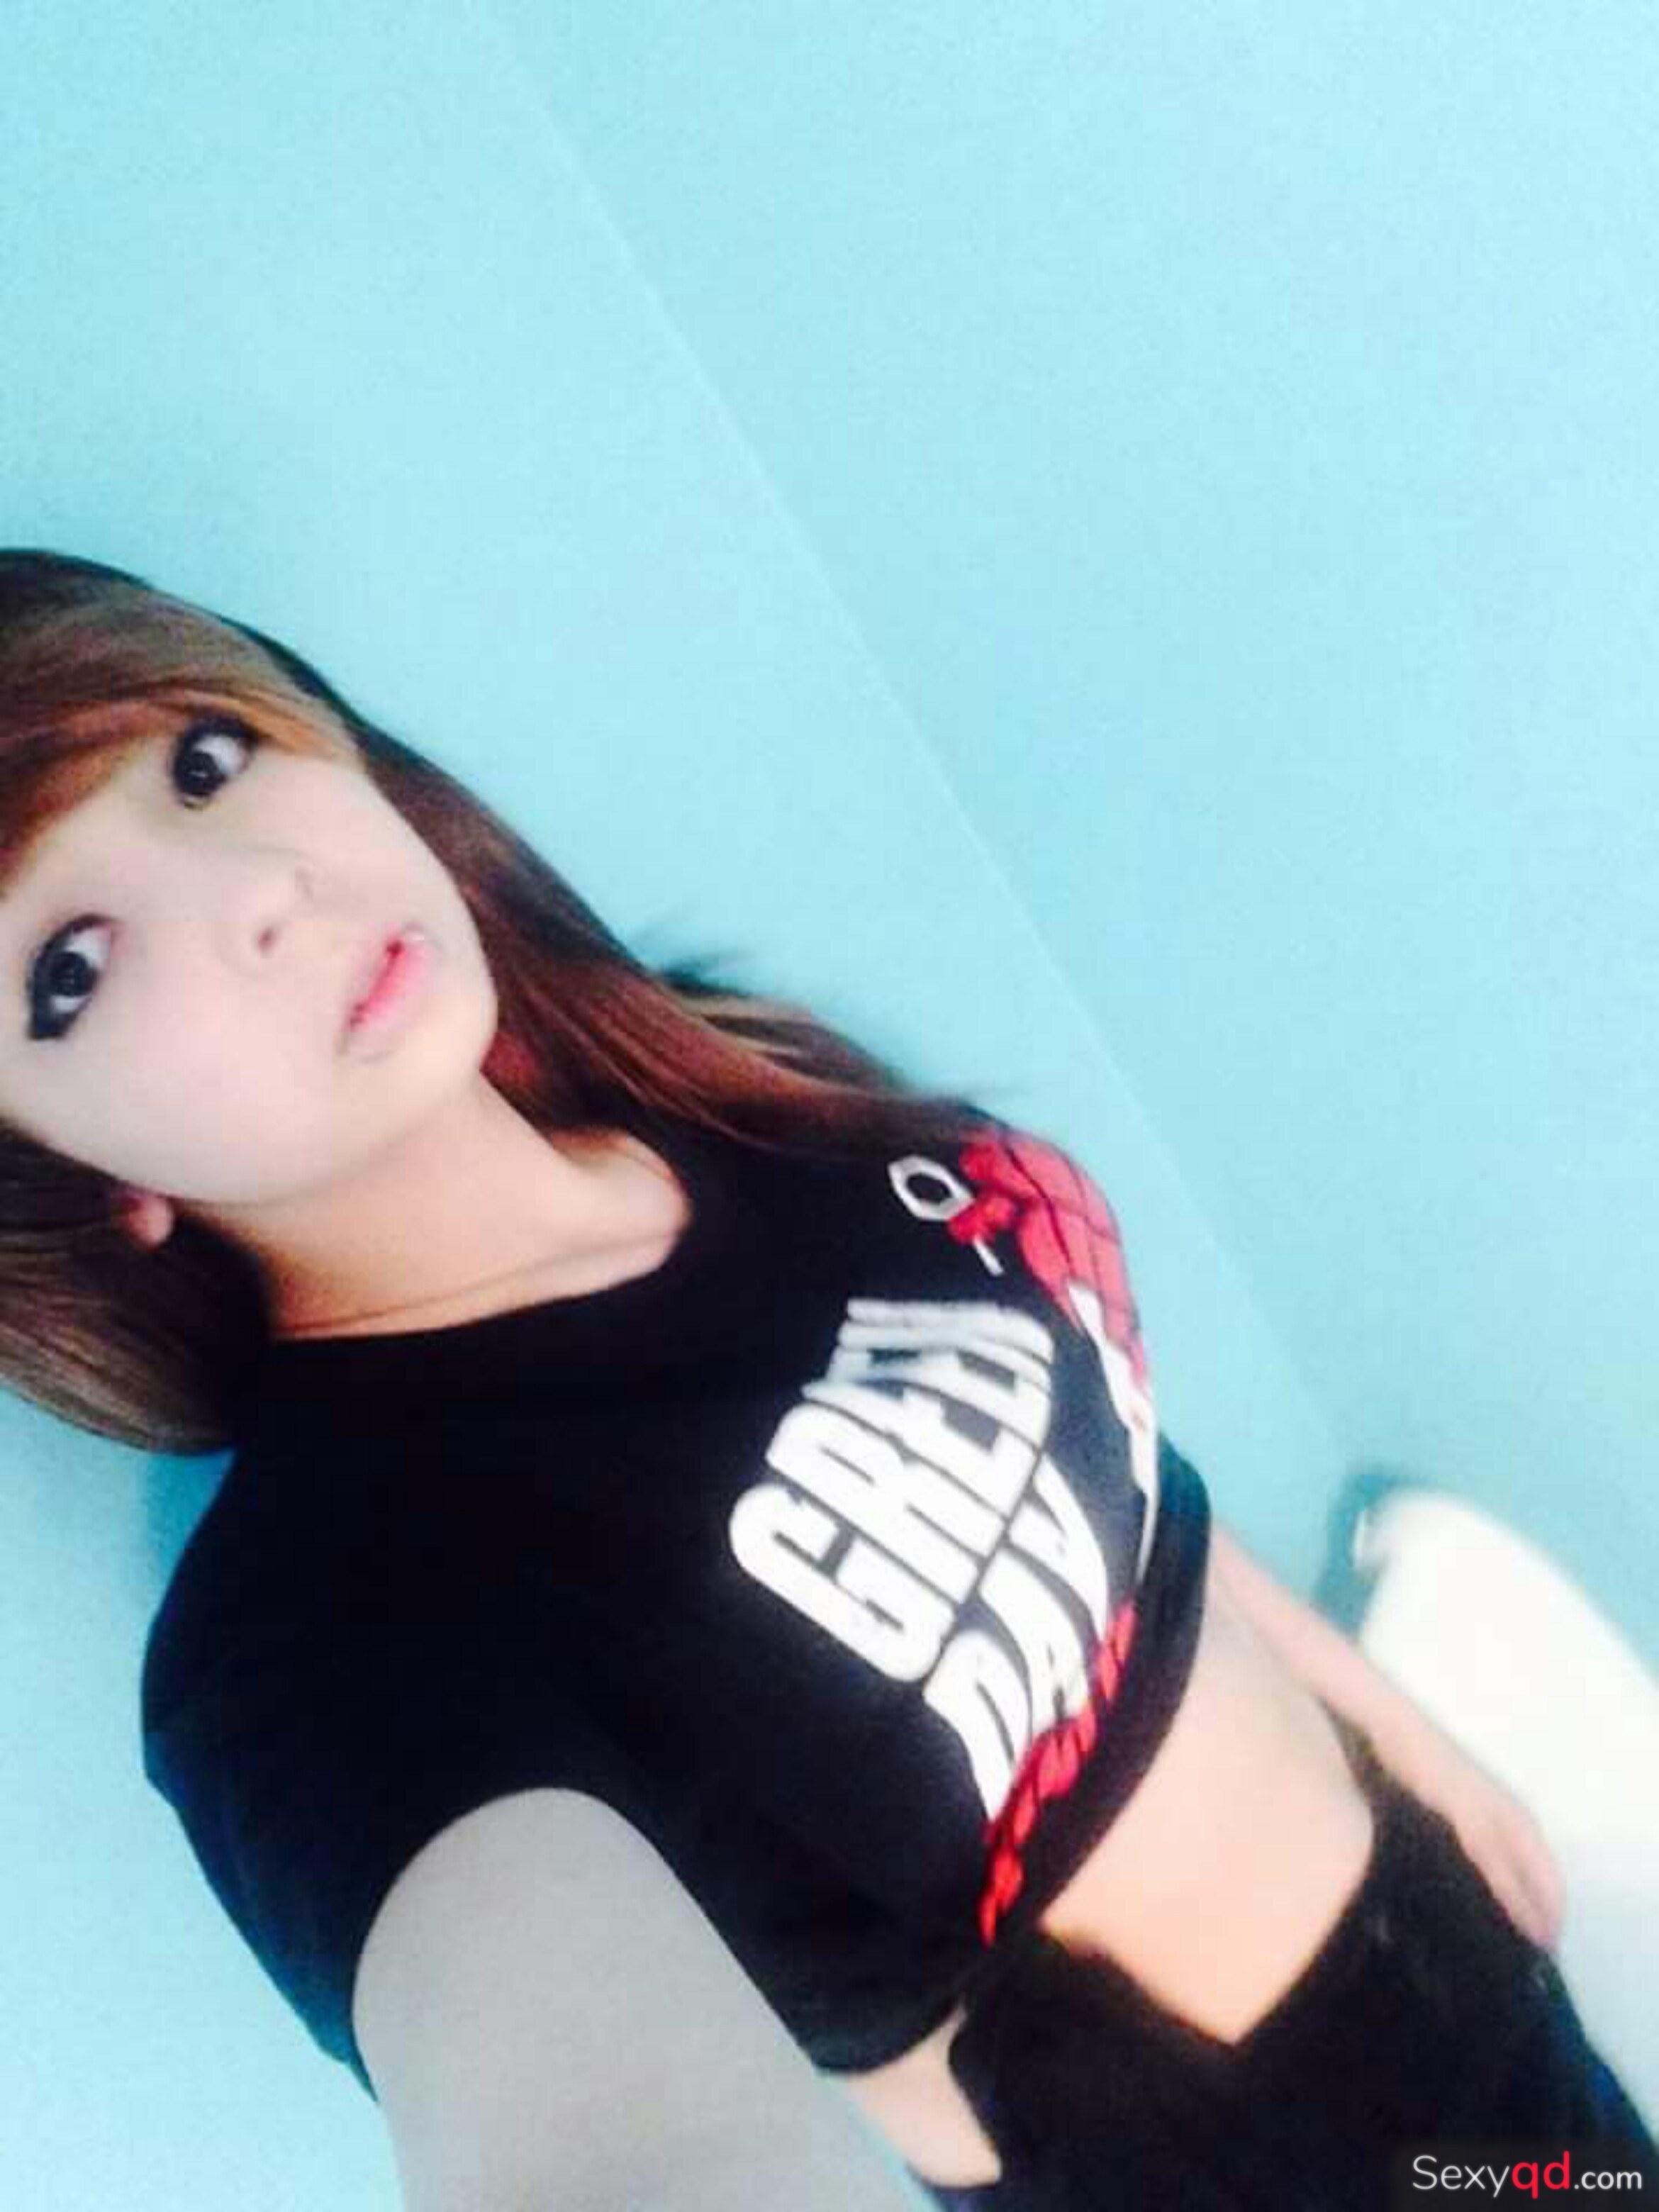 Cute asian college girl posing nude